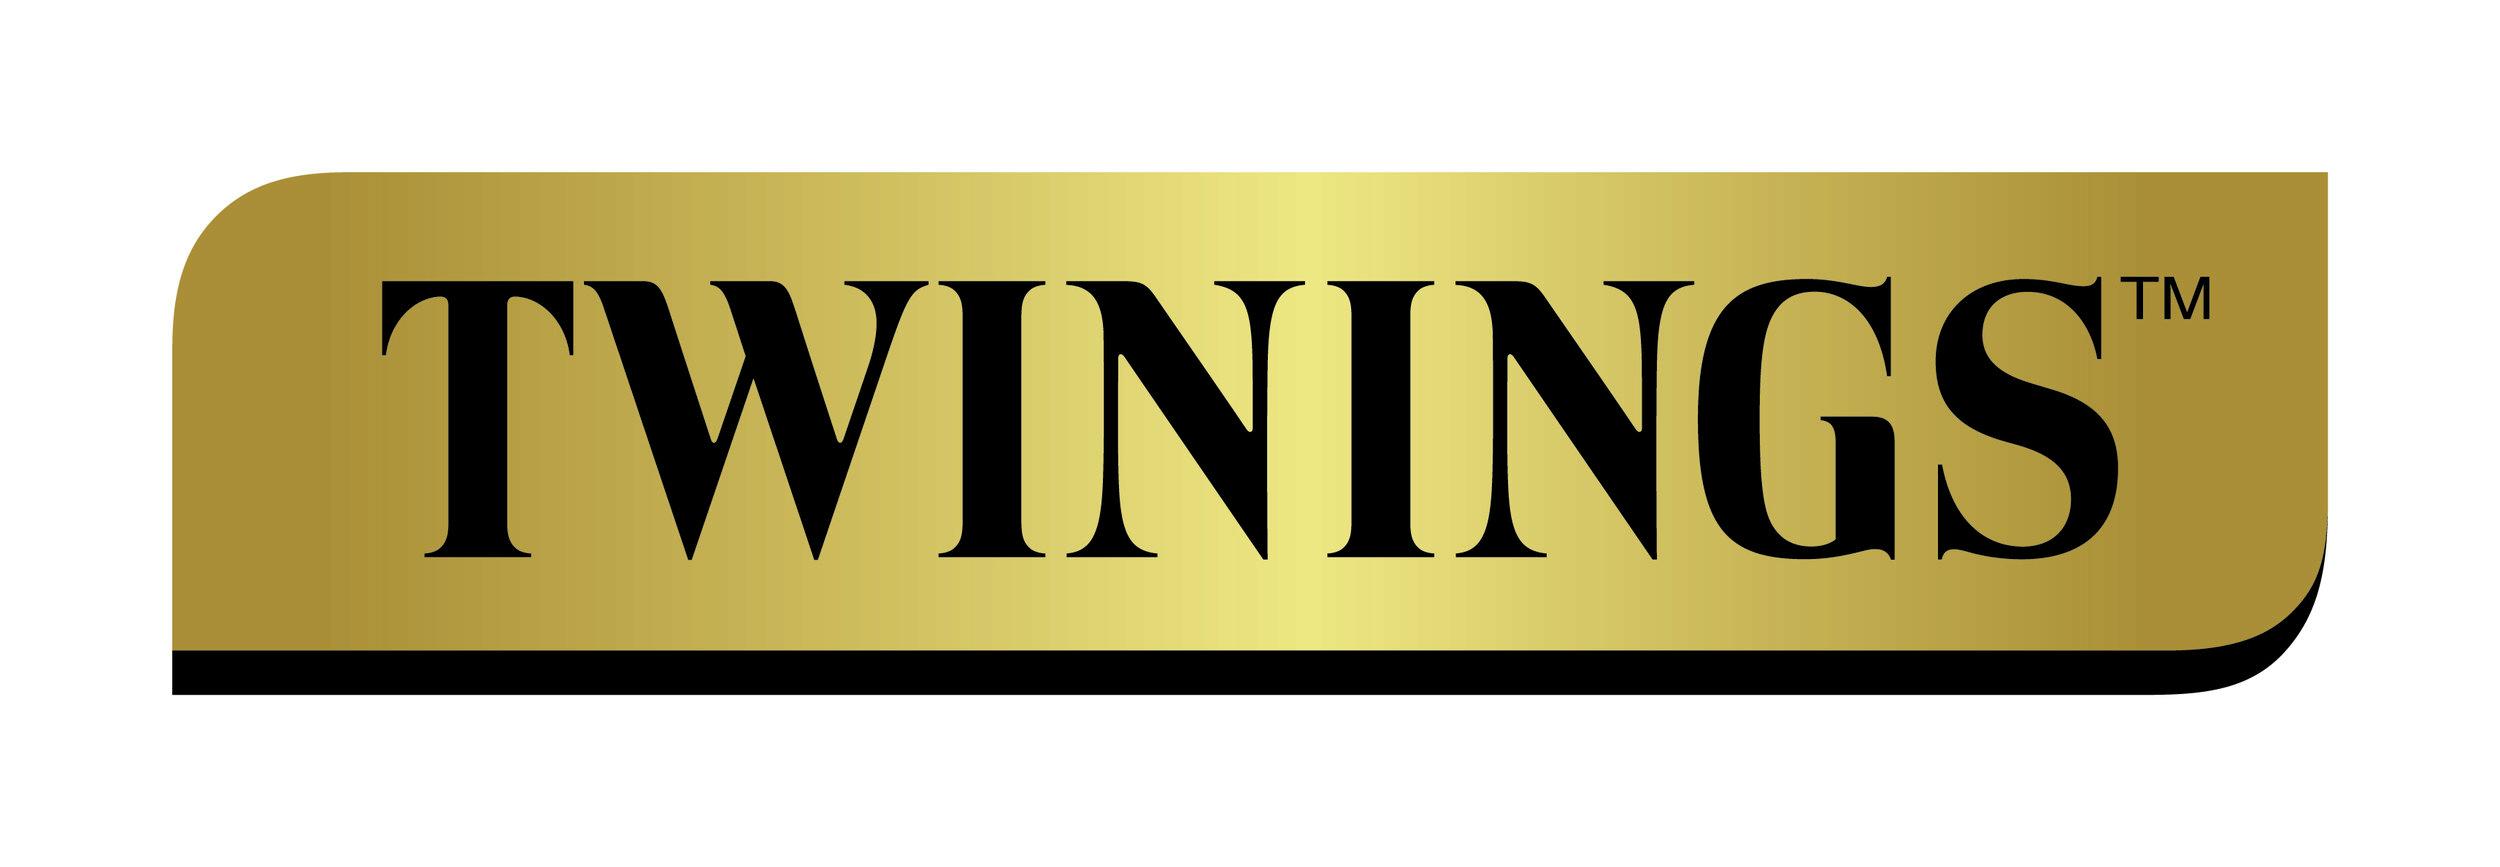 new_twinings_logo_with_TM.JPG